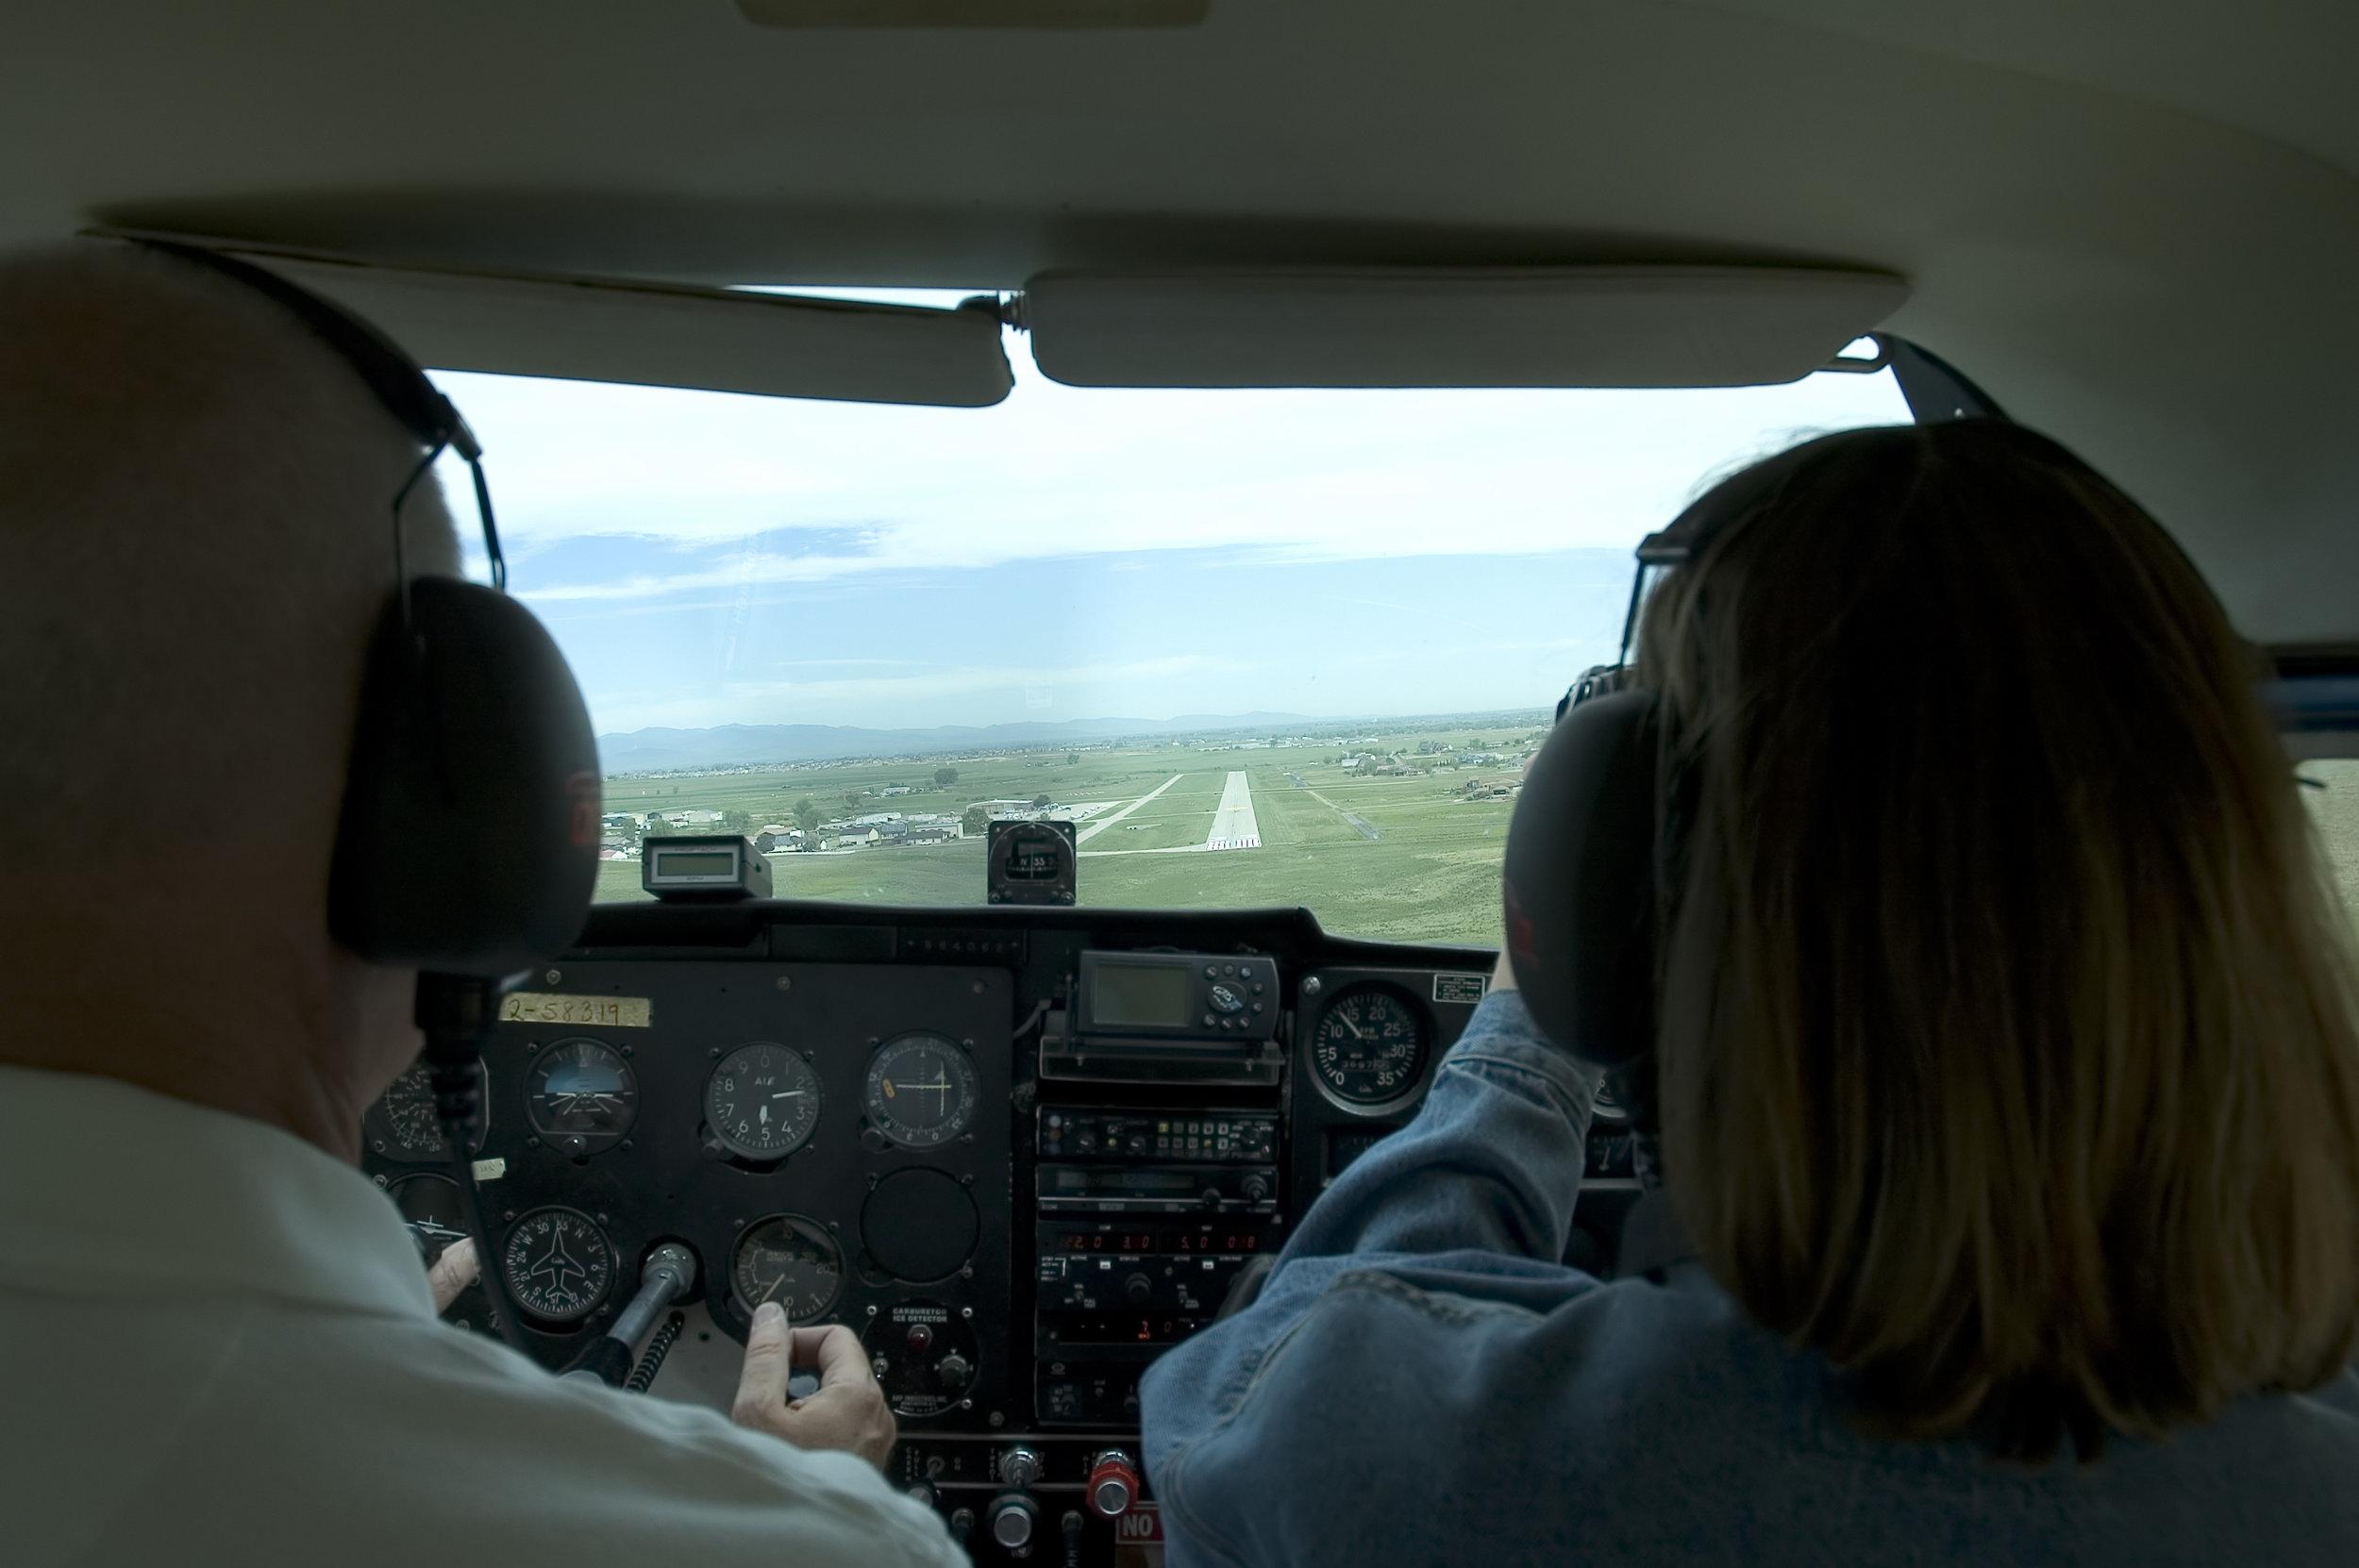 VAN NUYS FLIGHT SIMULATOR TRAINING